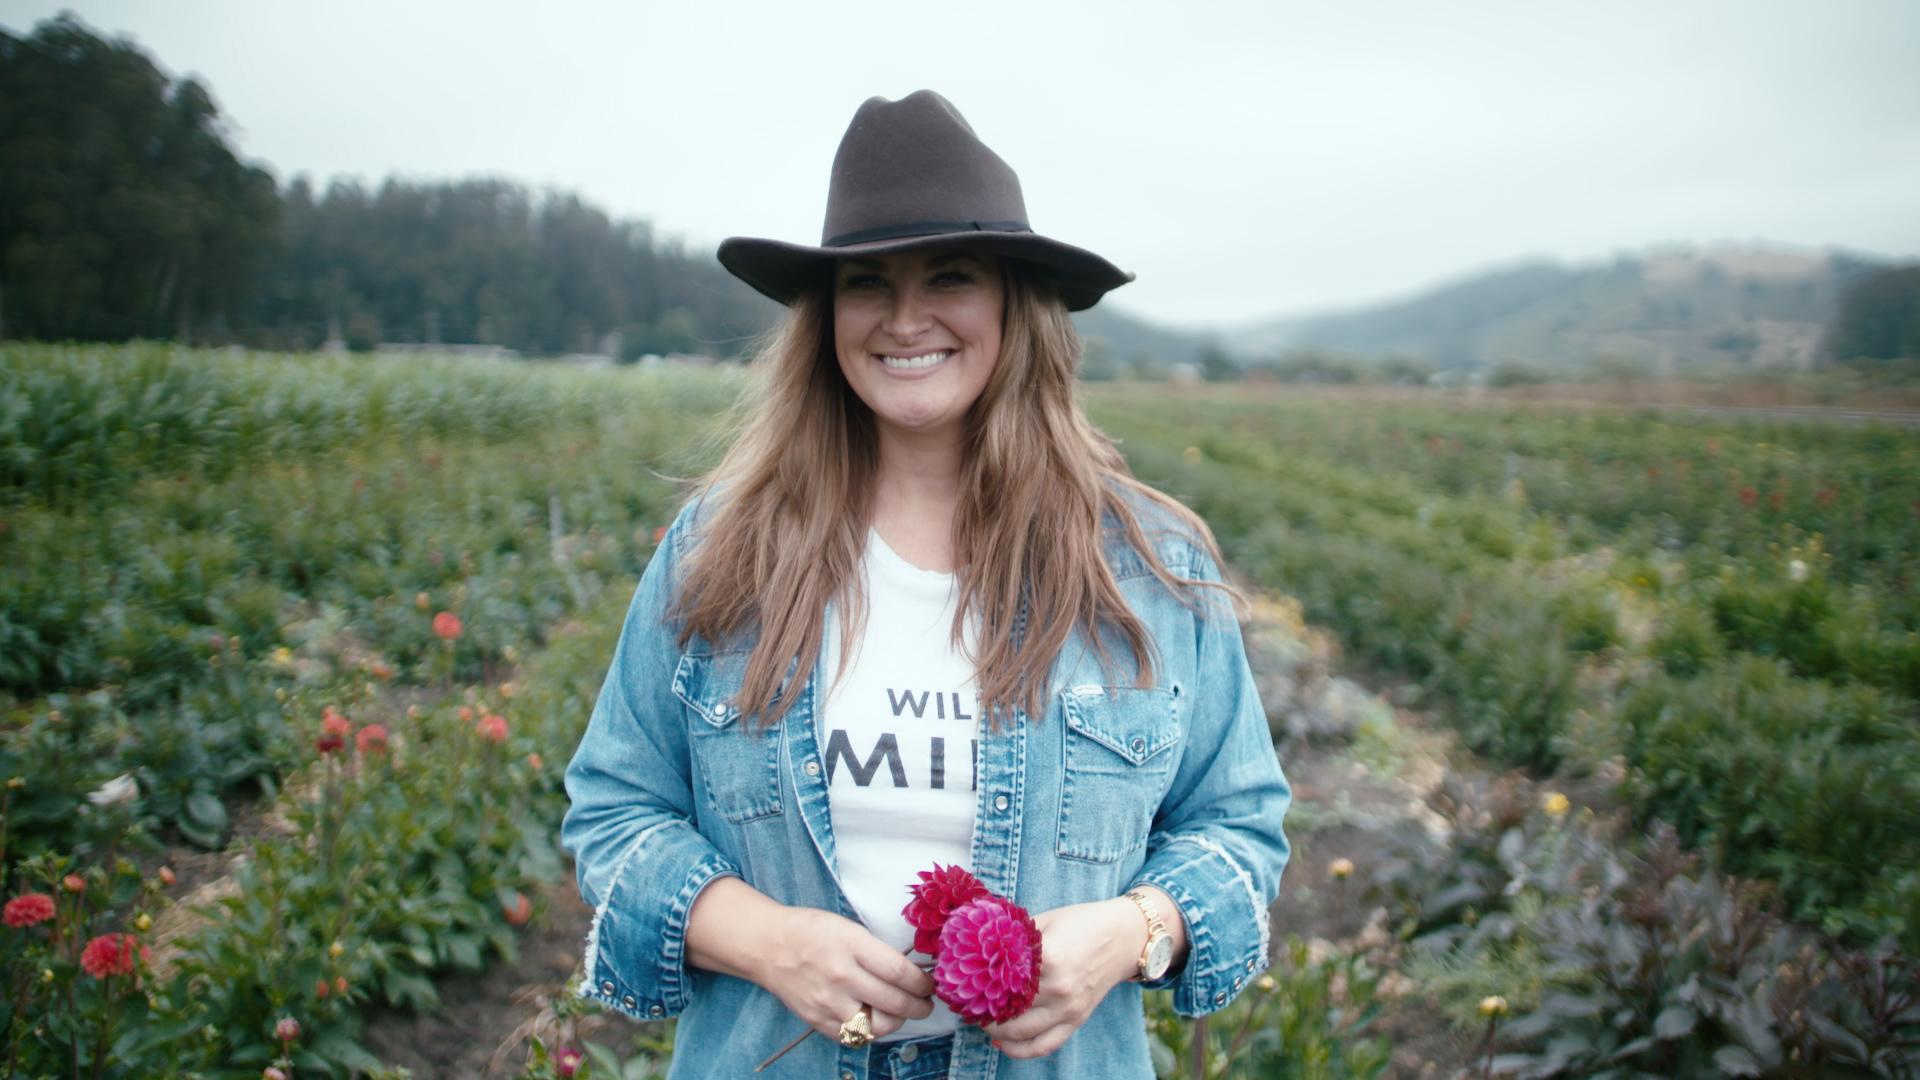 Pics farm girl Hot Farmers